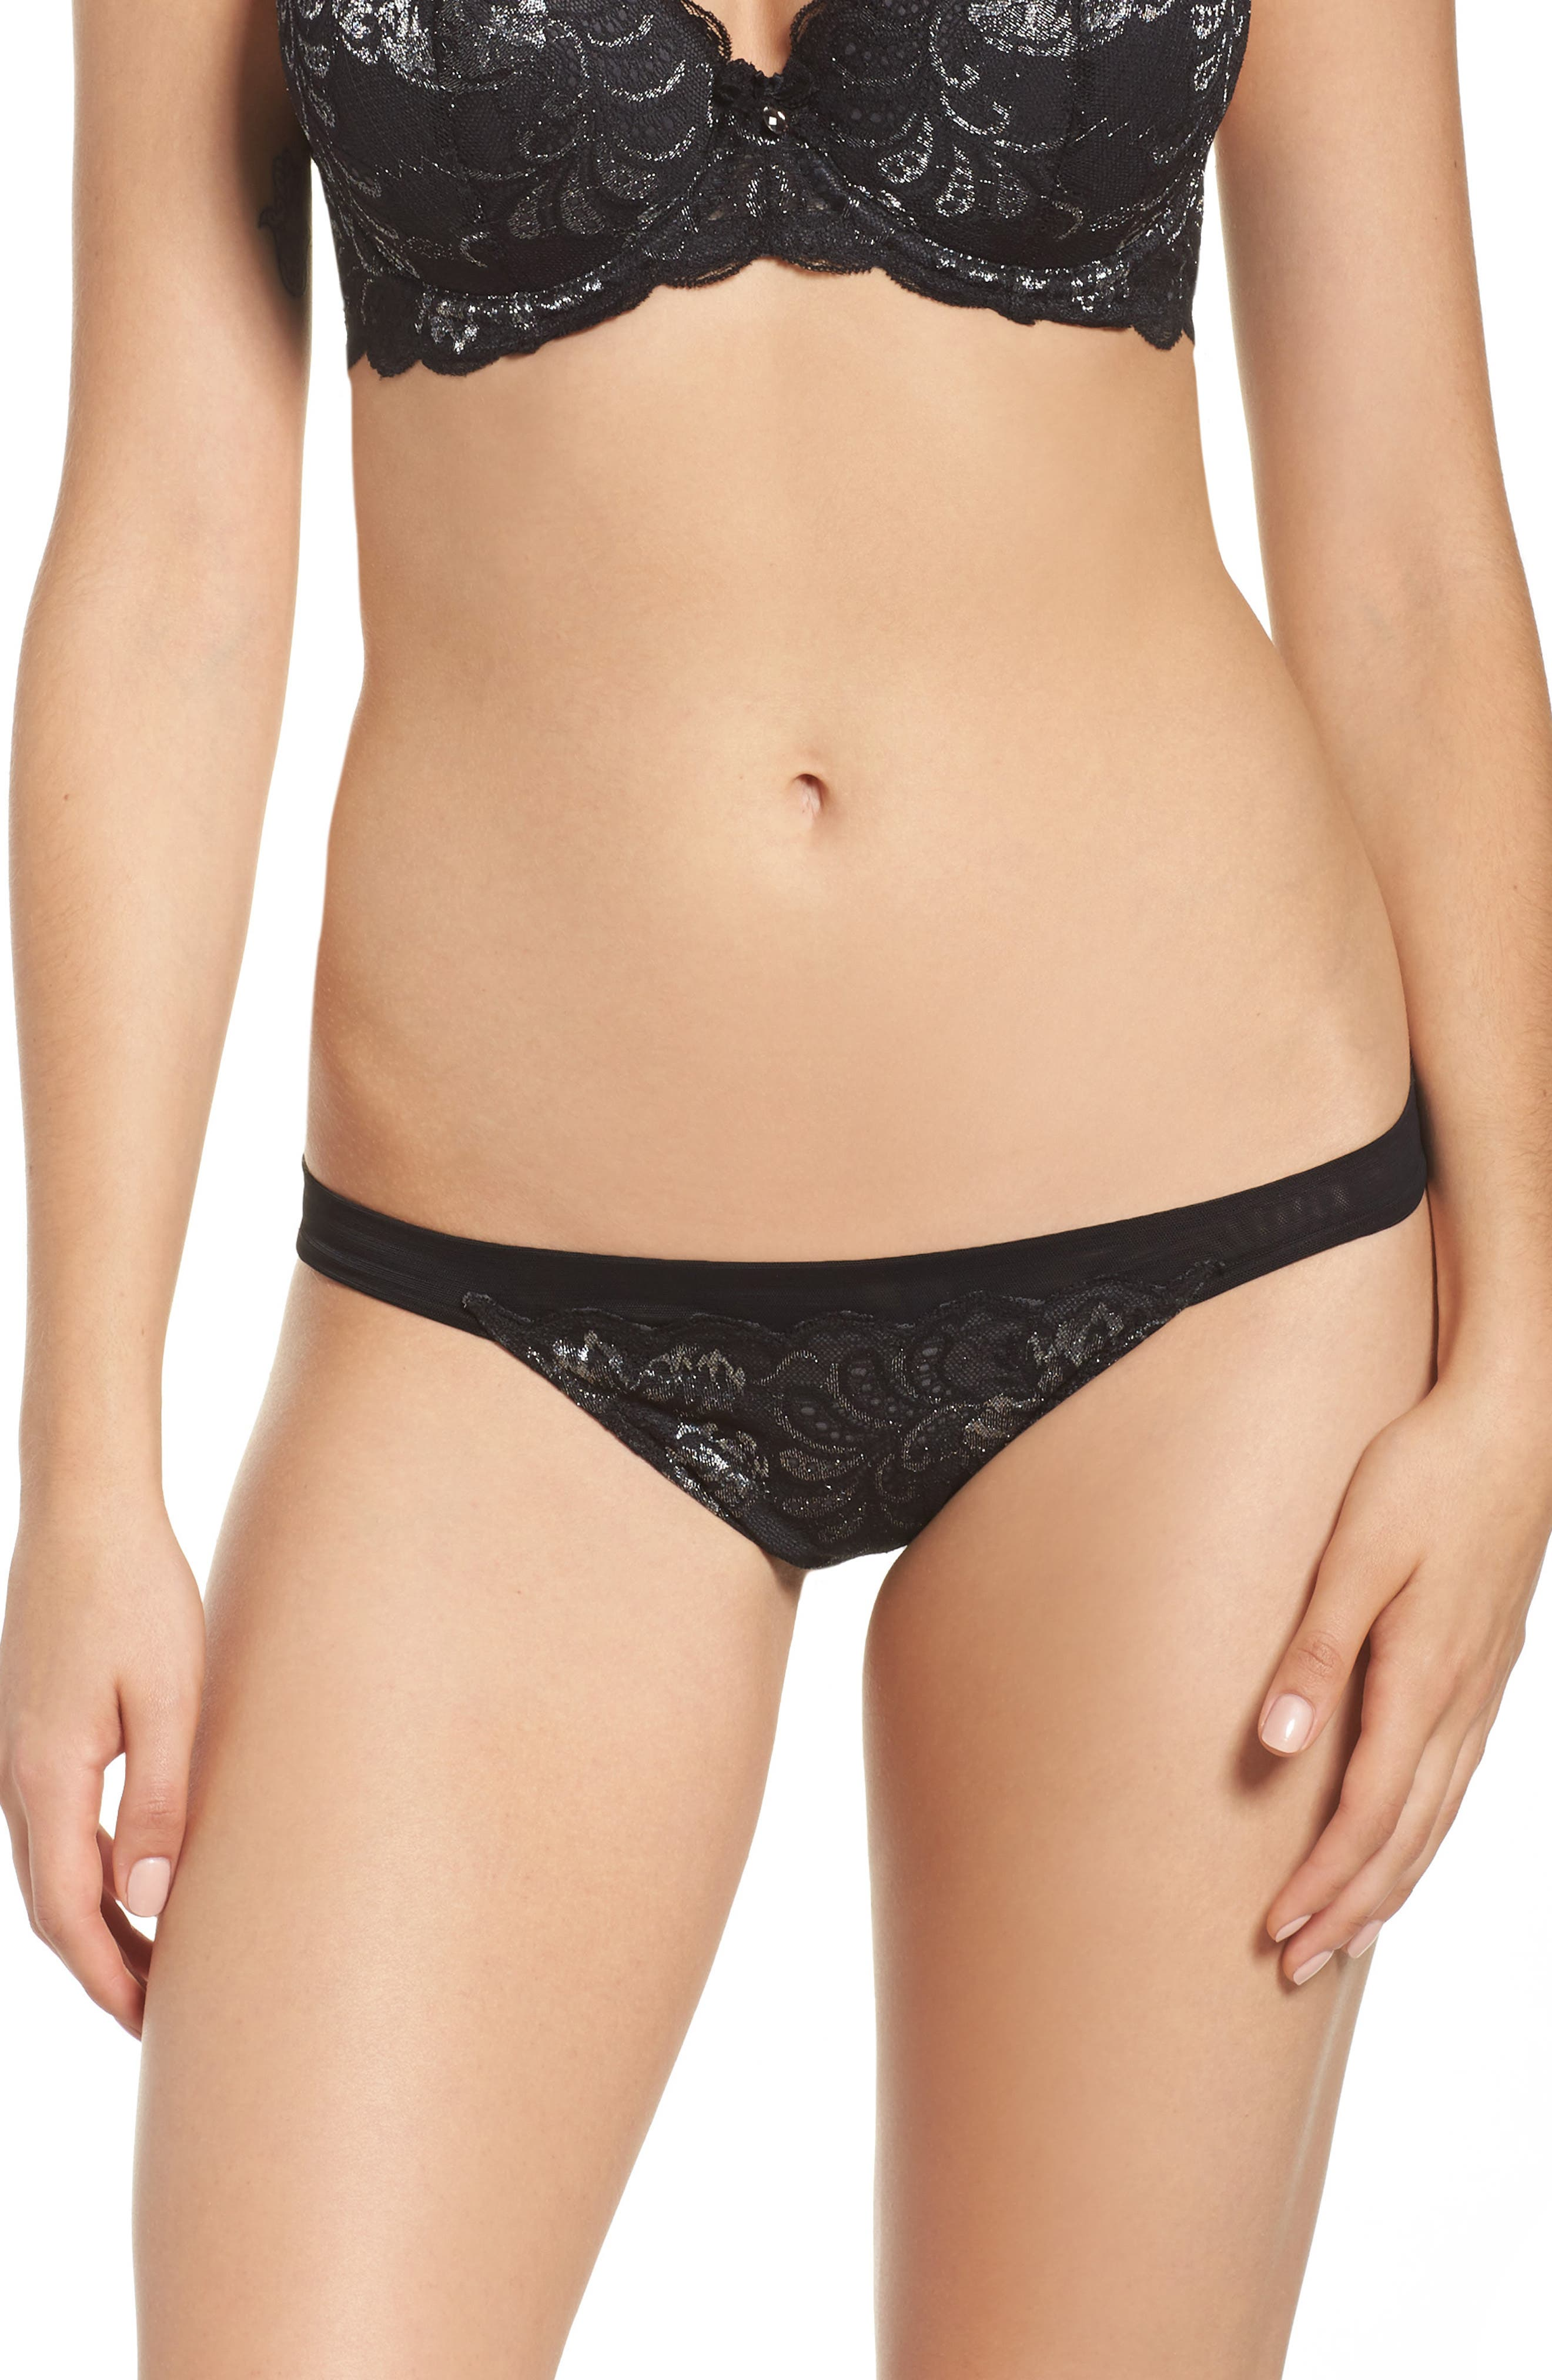 'Sophia' Lace Bikini,                             Main thumbnail 1, color,                             013